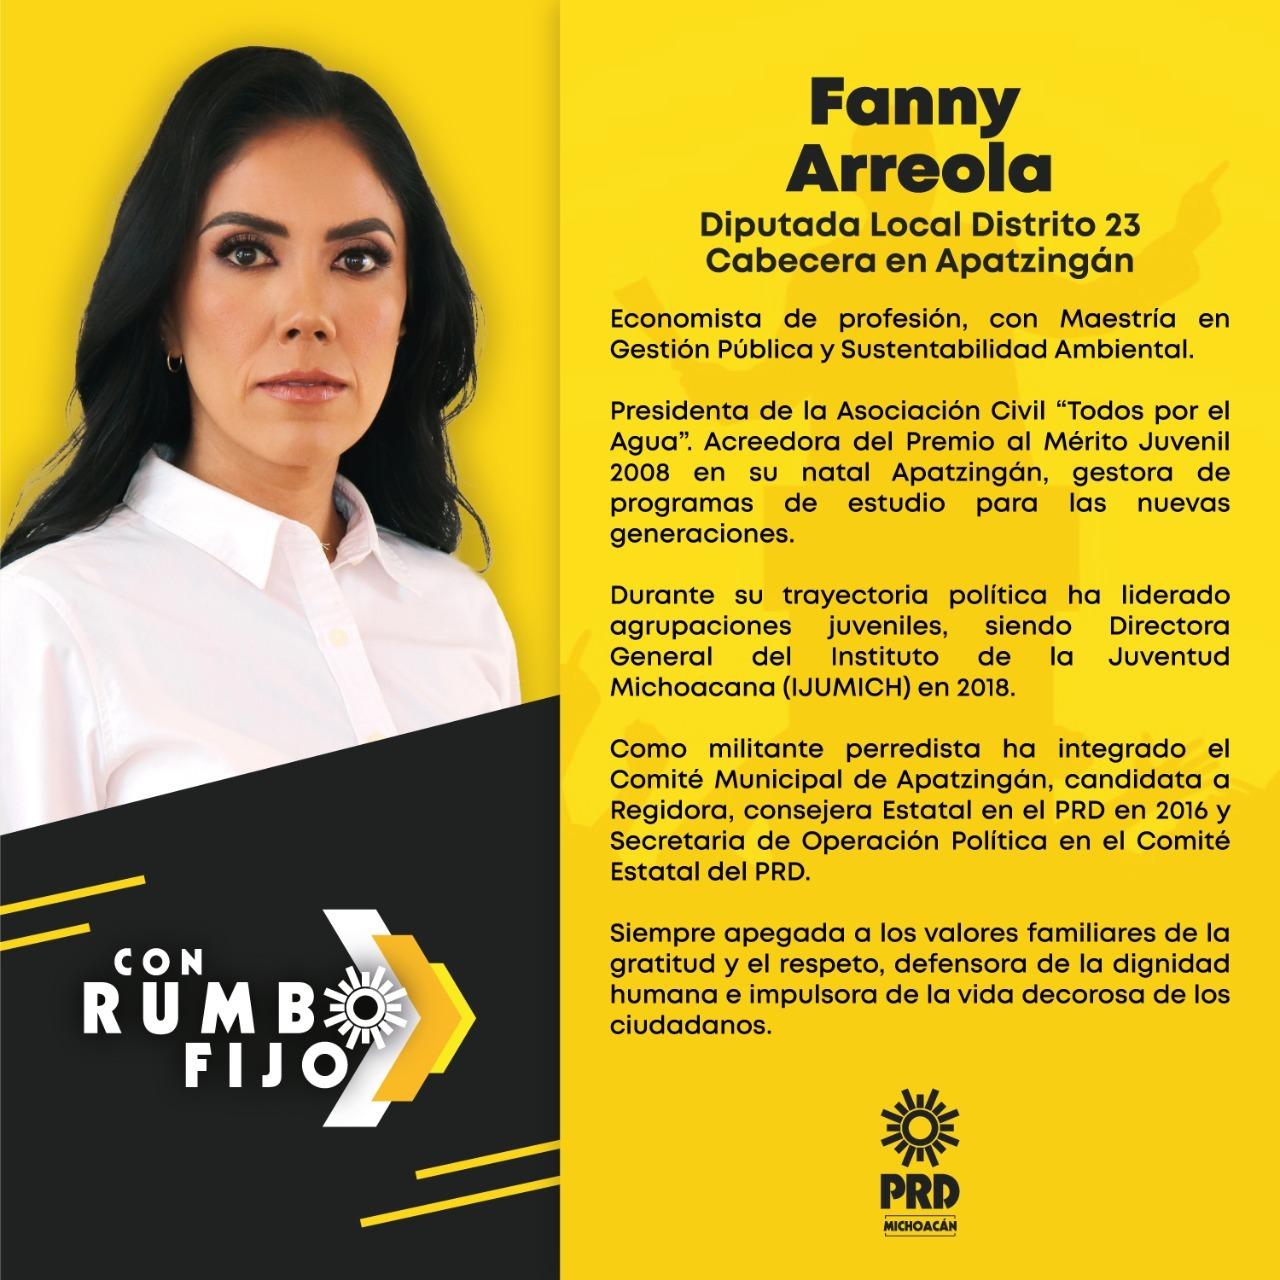 Fanny Arreola, Diputada local Distrito 23 Cabecera en Apatzingán